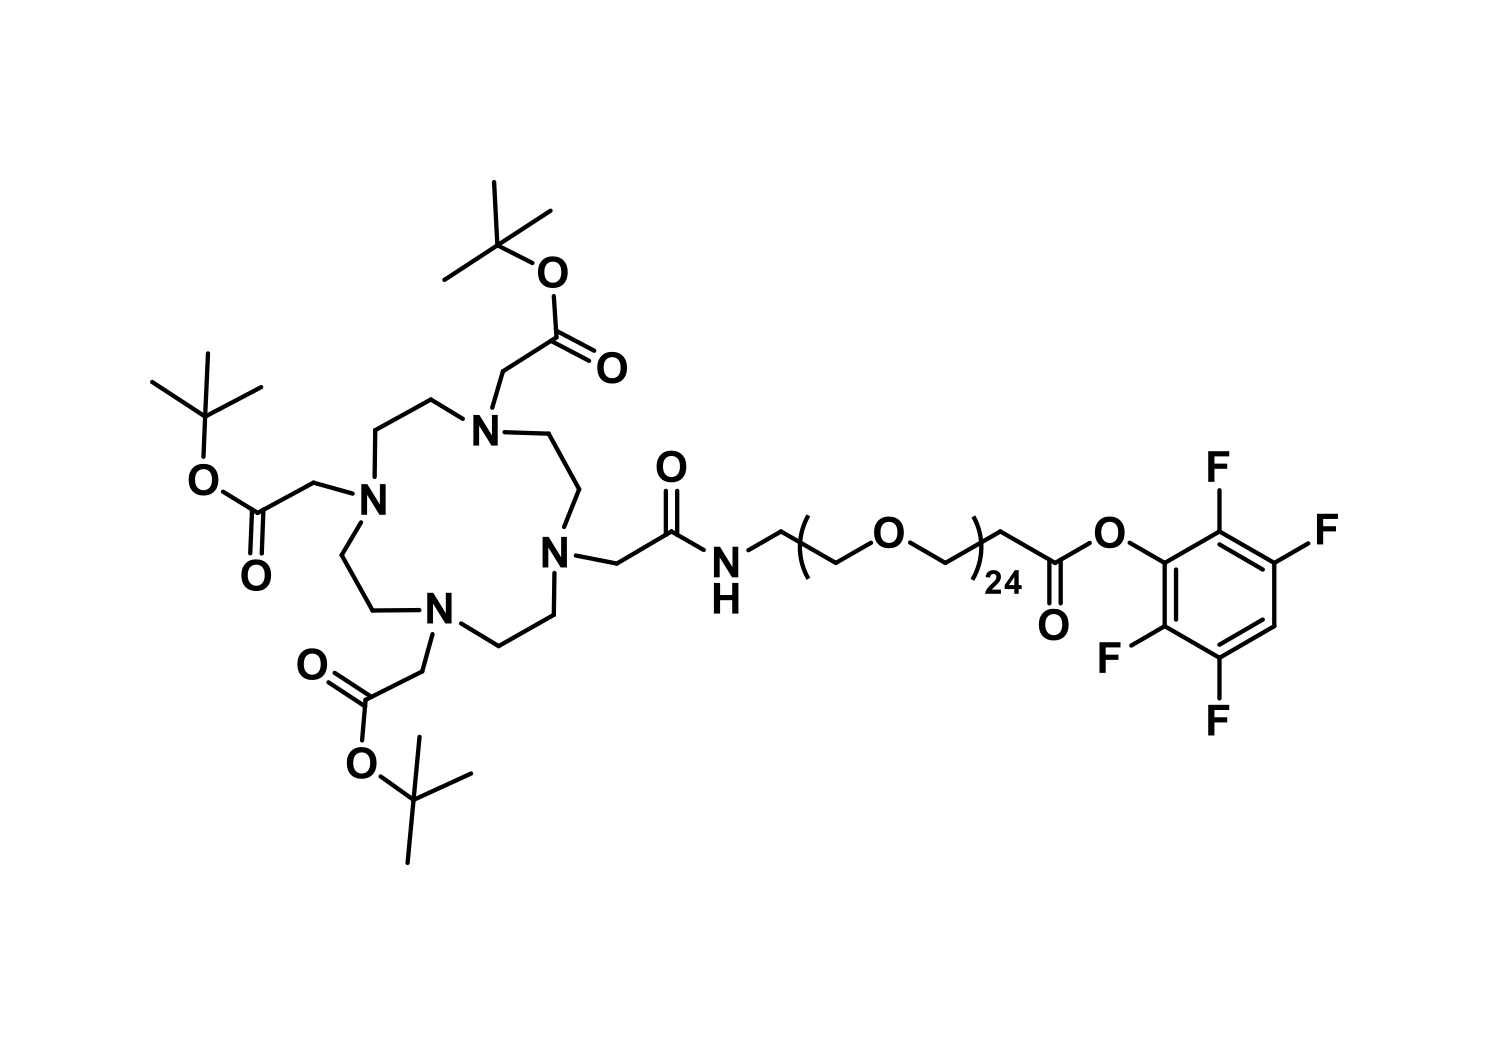 DOTA-tris(TBE)-amido-dPEG®₂₄-TFP ester